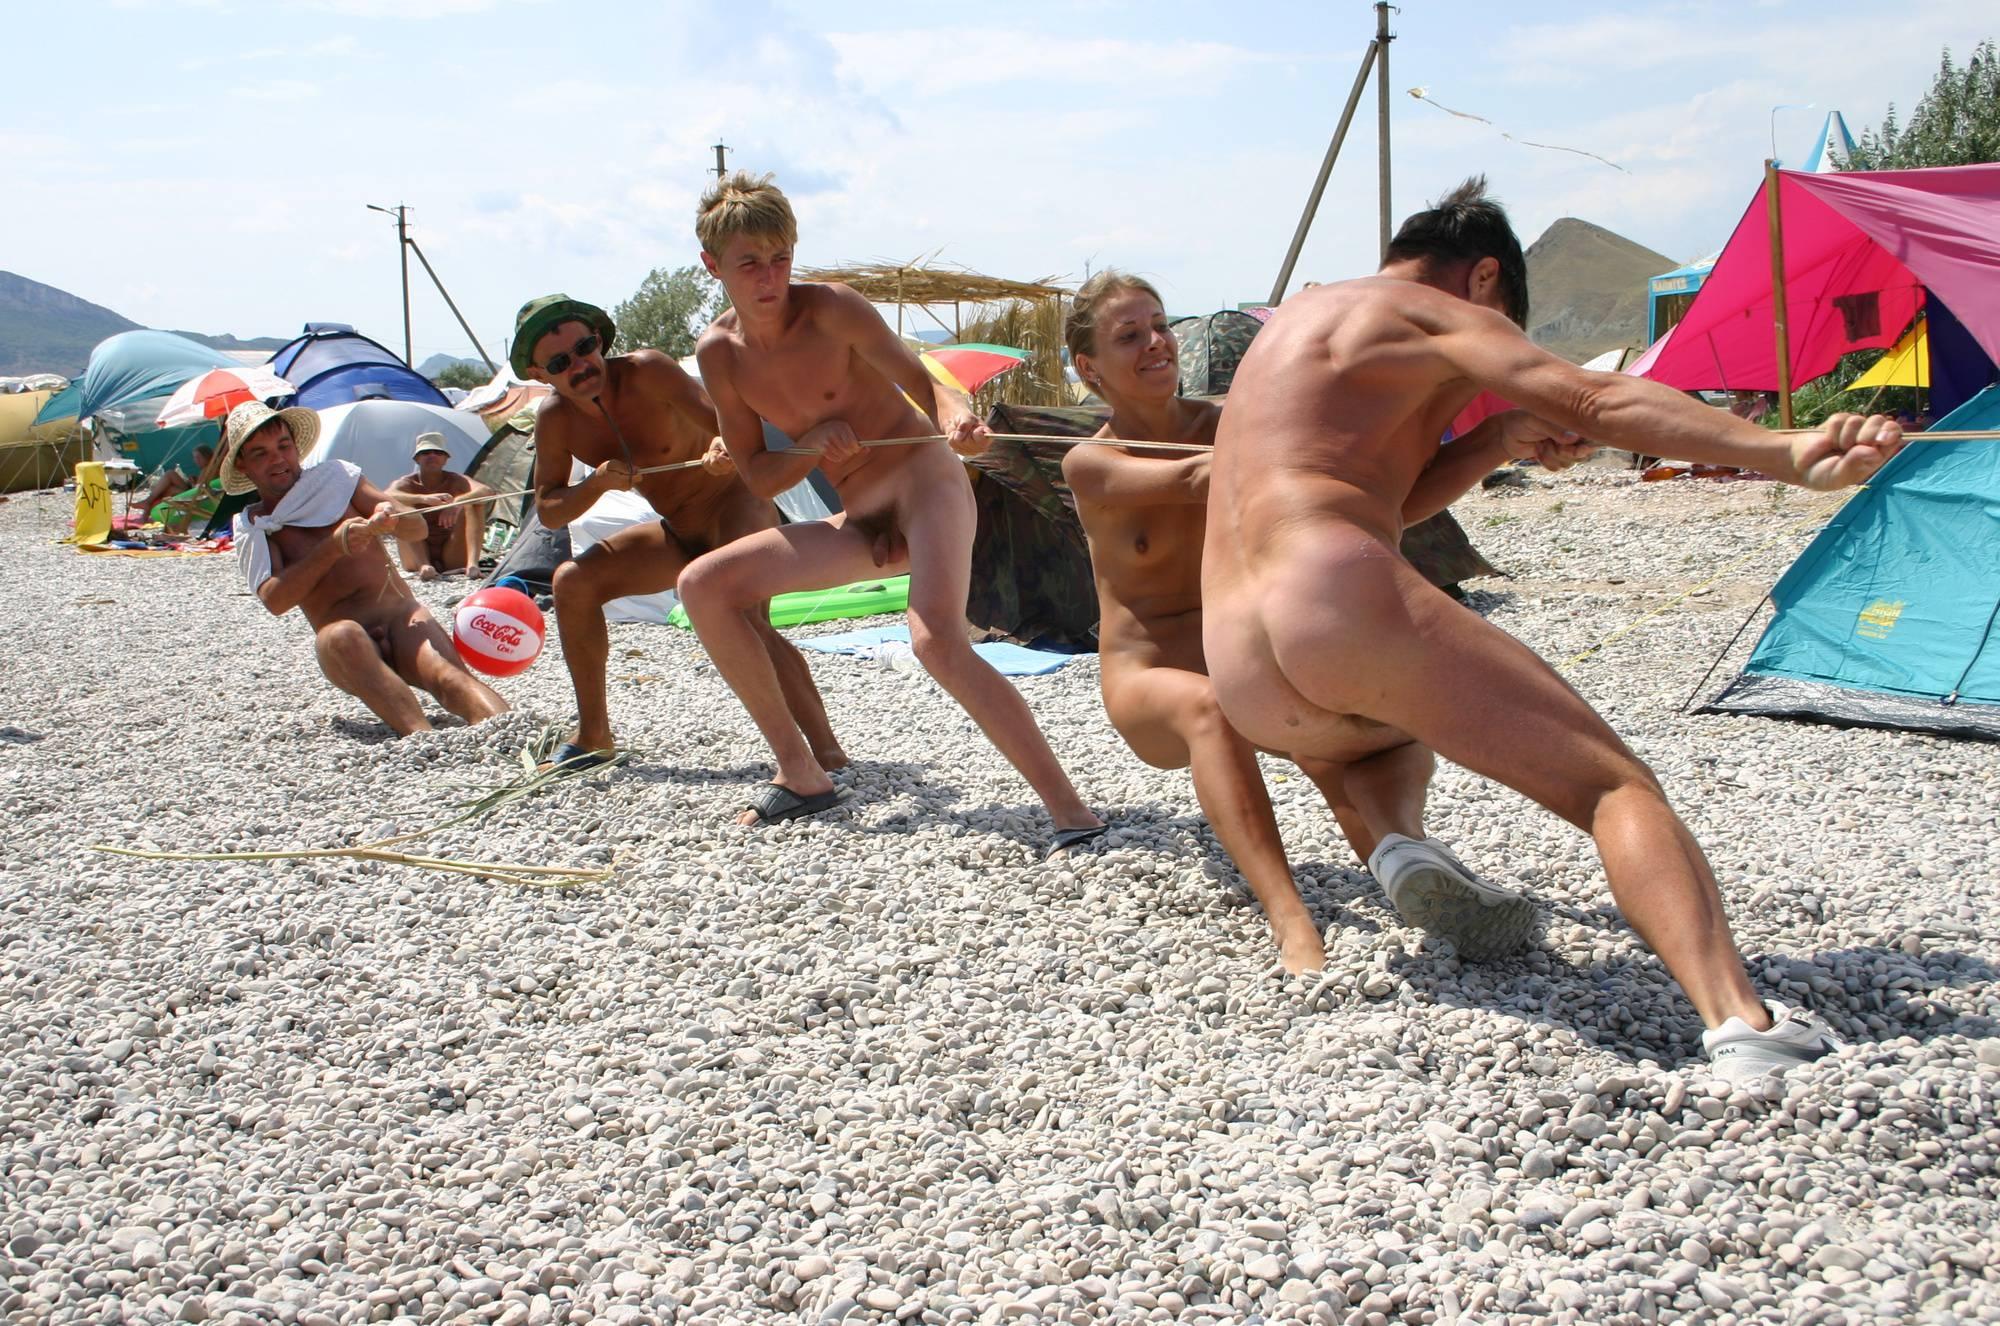 Nudist Photos Naturist Kids Tug of War - 1